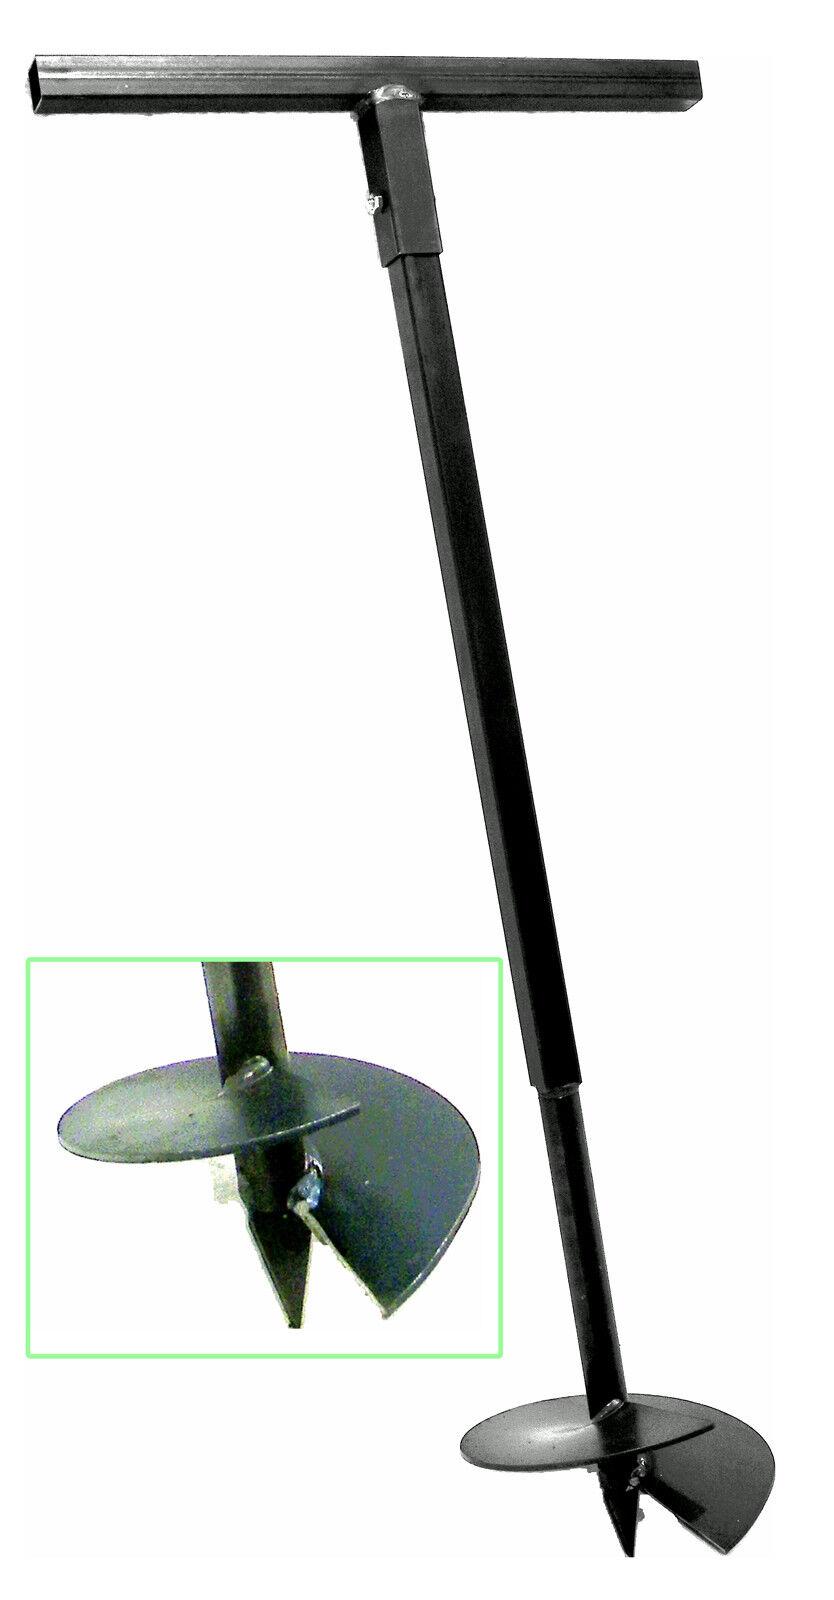 Mano ahoyador 230 mm perforadora erdlochausheber lochspaten pflanzbohrer